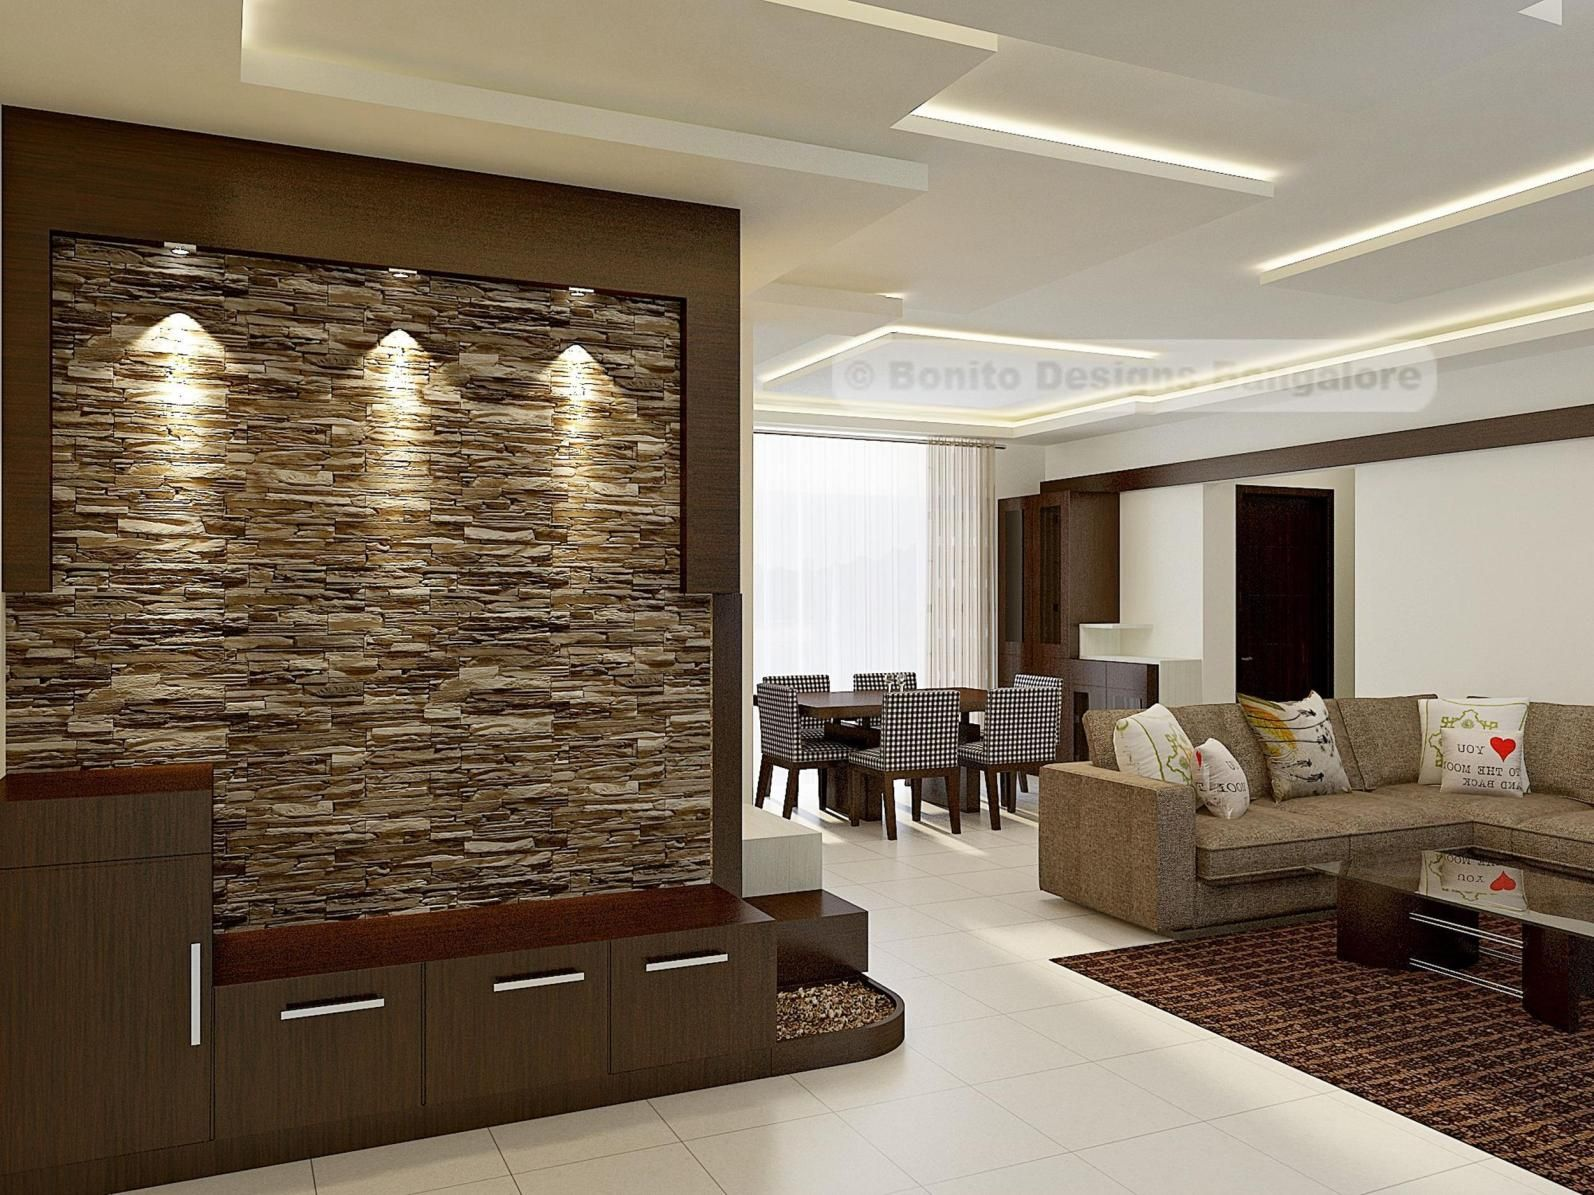 38 Perfect Living Room Smooth Stone Interior Walls Ideas Decor Renewal Cladding Design Stone Walls Interior Stone Cladding Interior